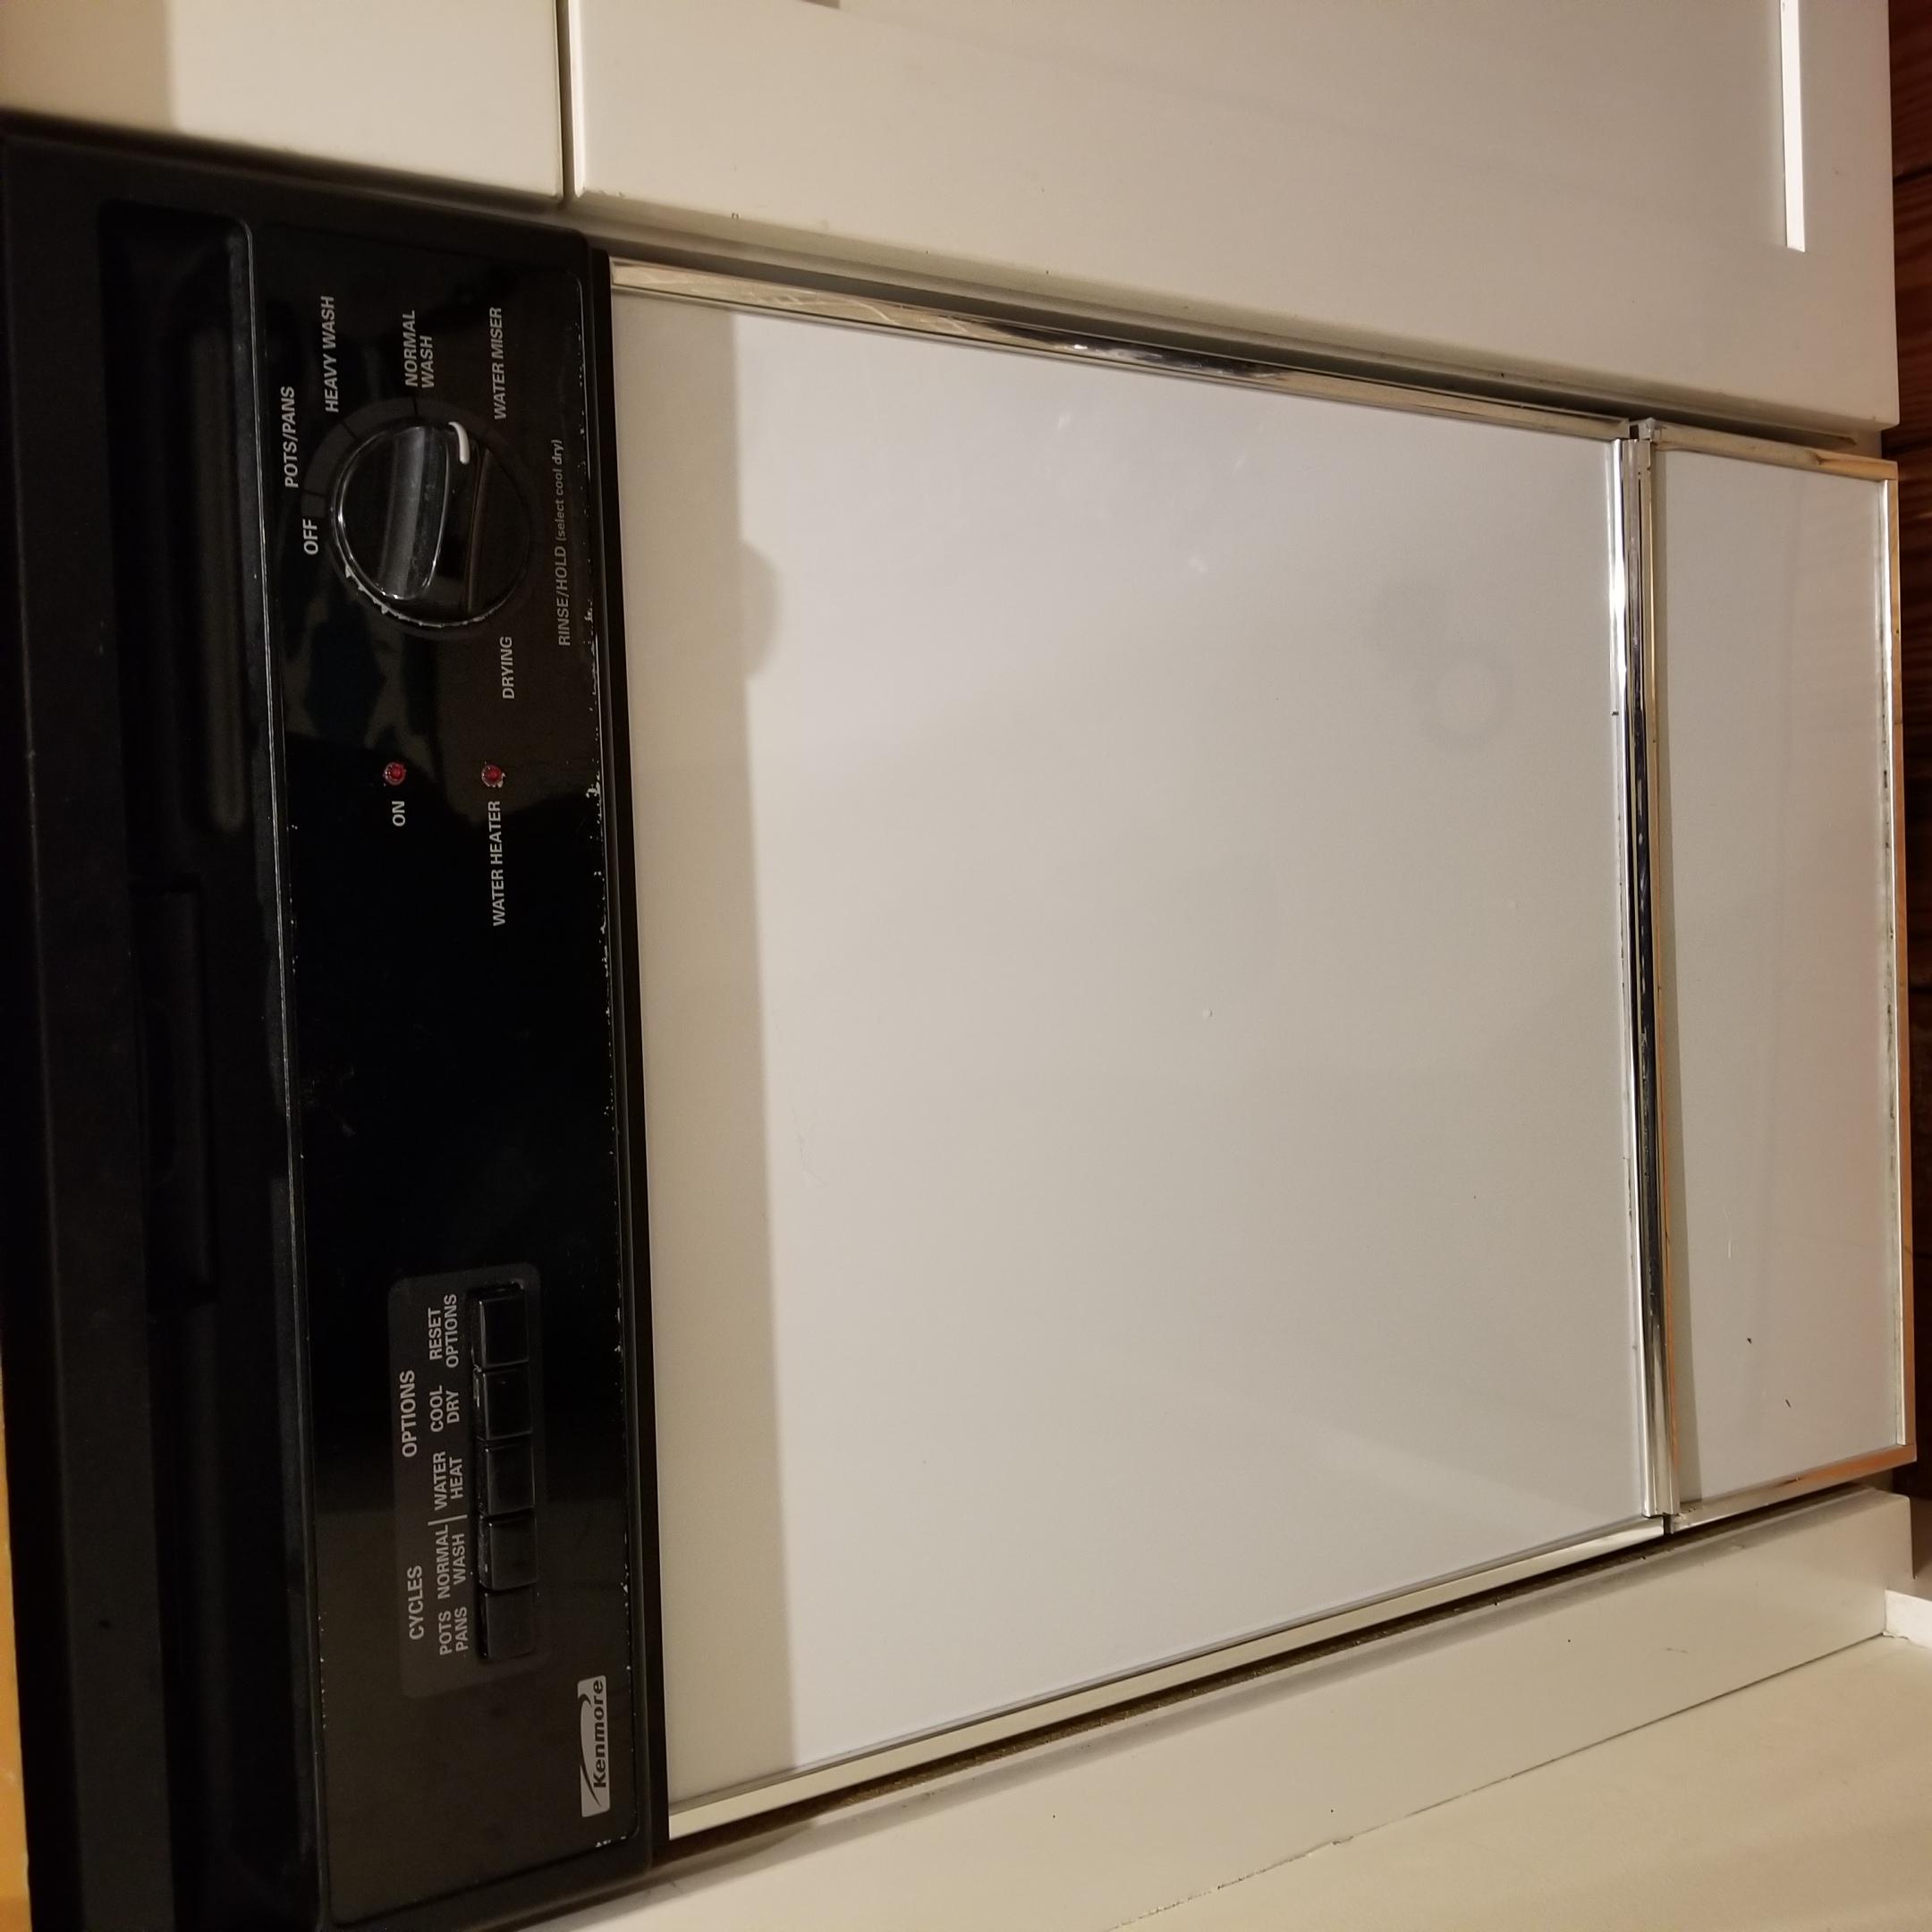 "Kenmore 24"" Dishwasher Model 587.14349690 Replaced"